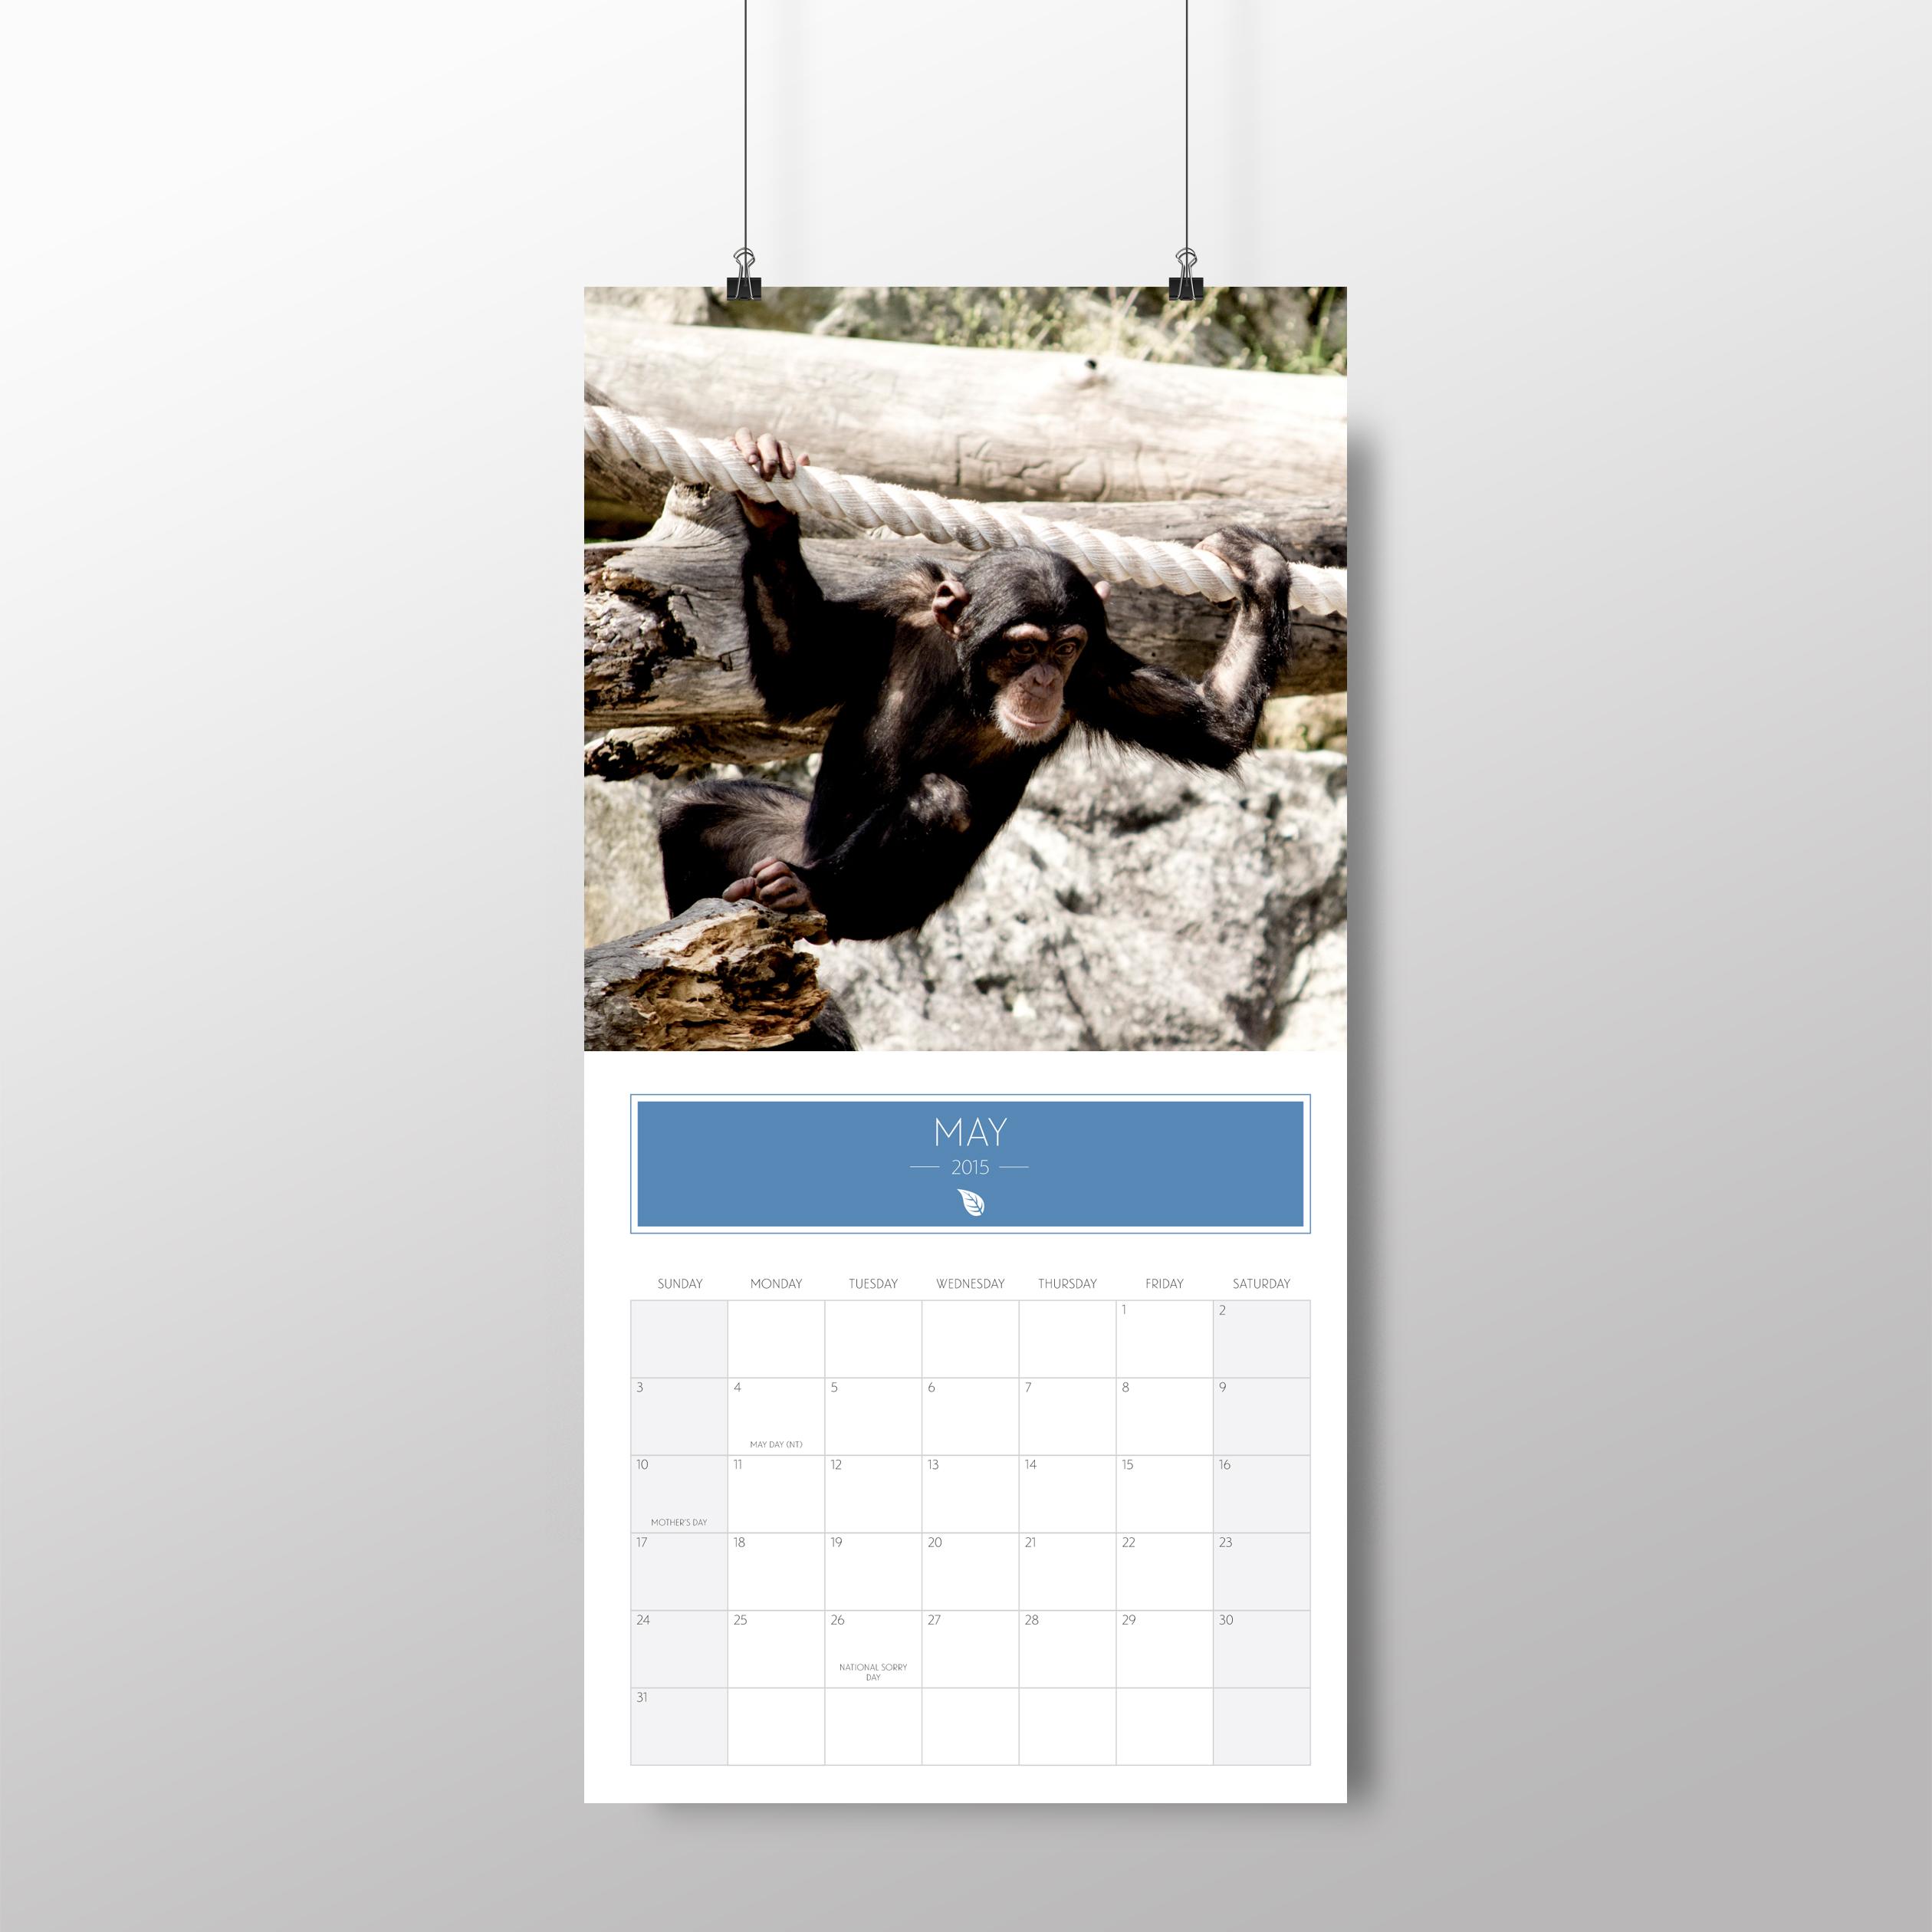 Animal calendar – May